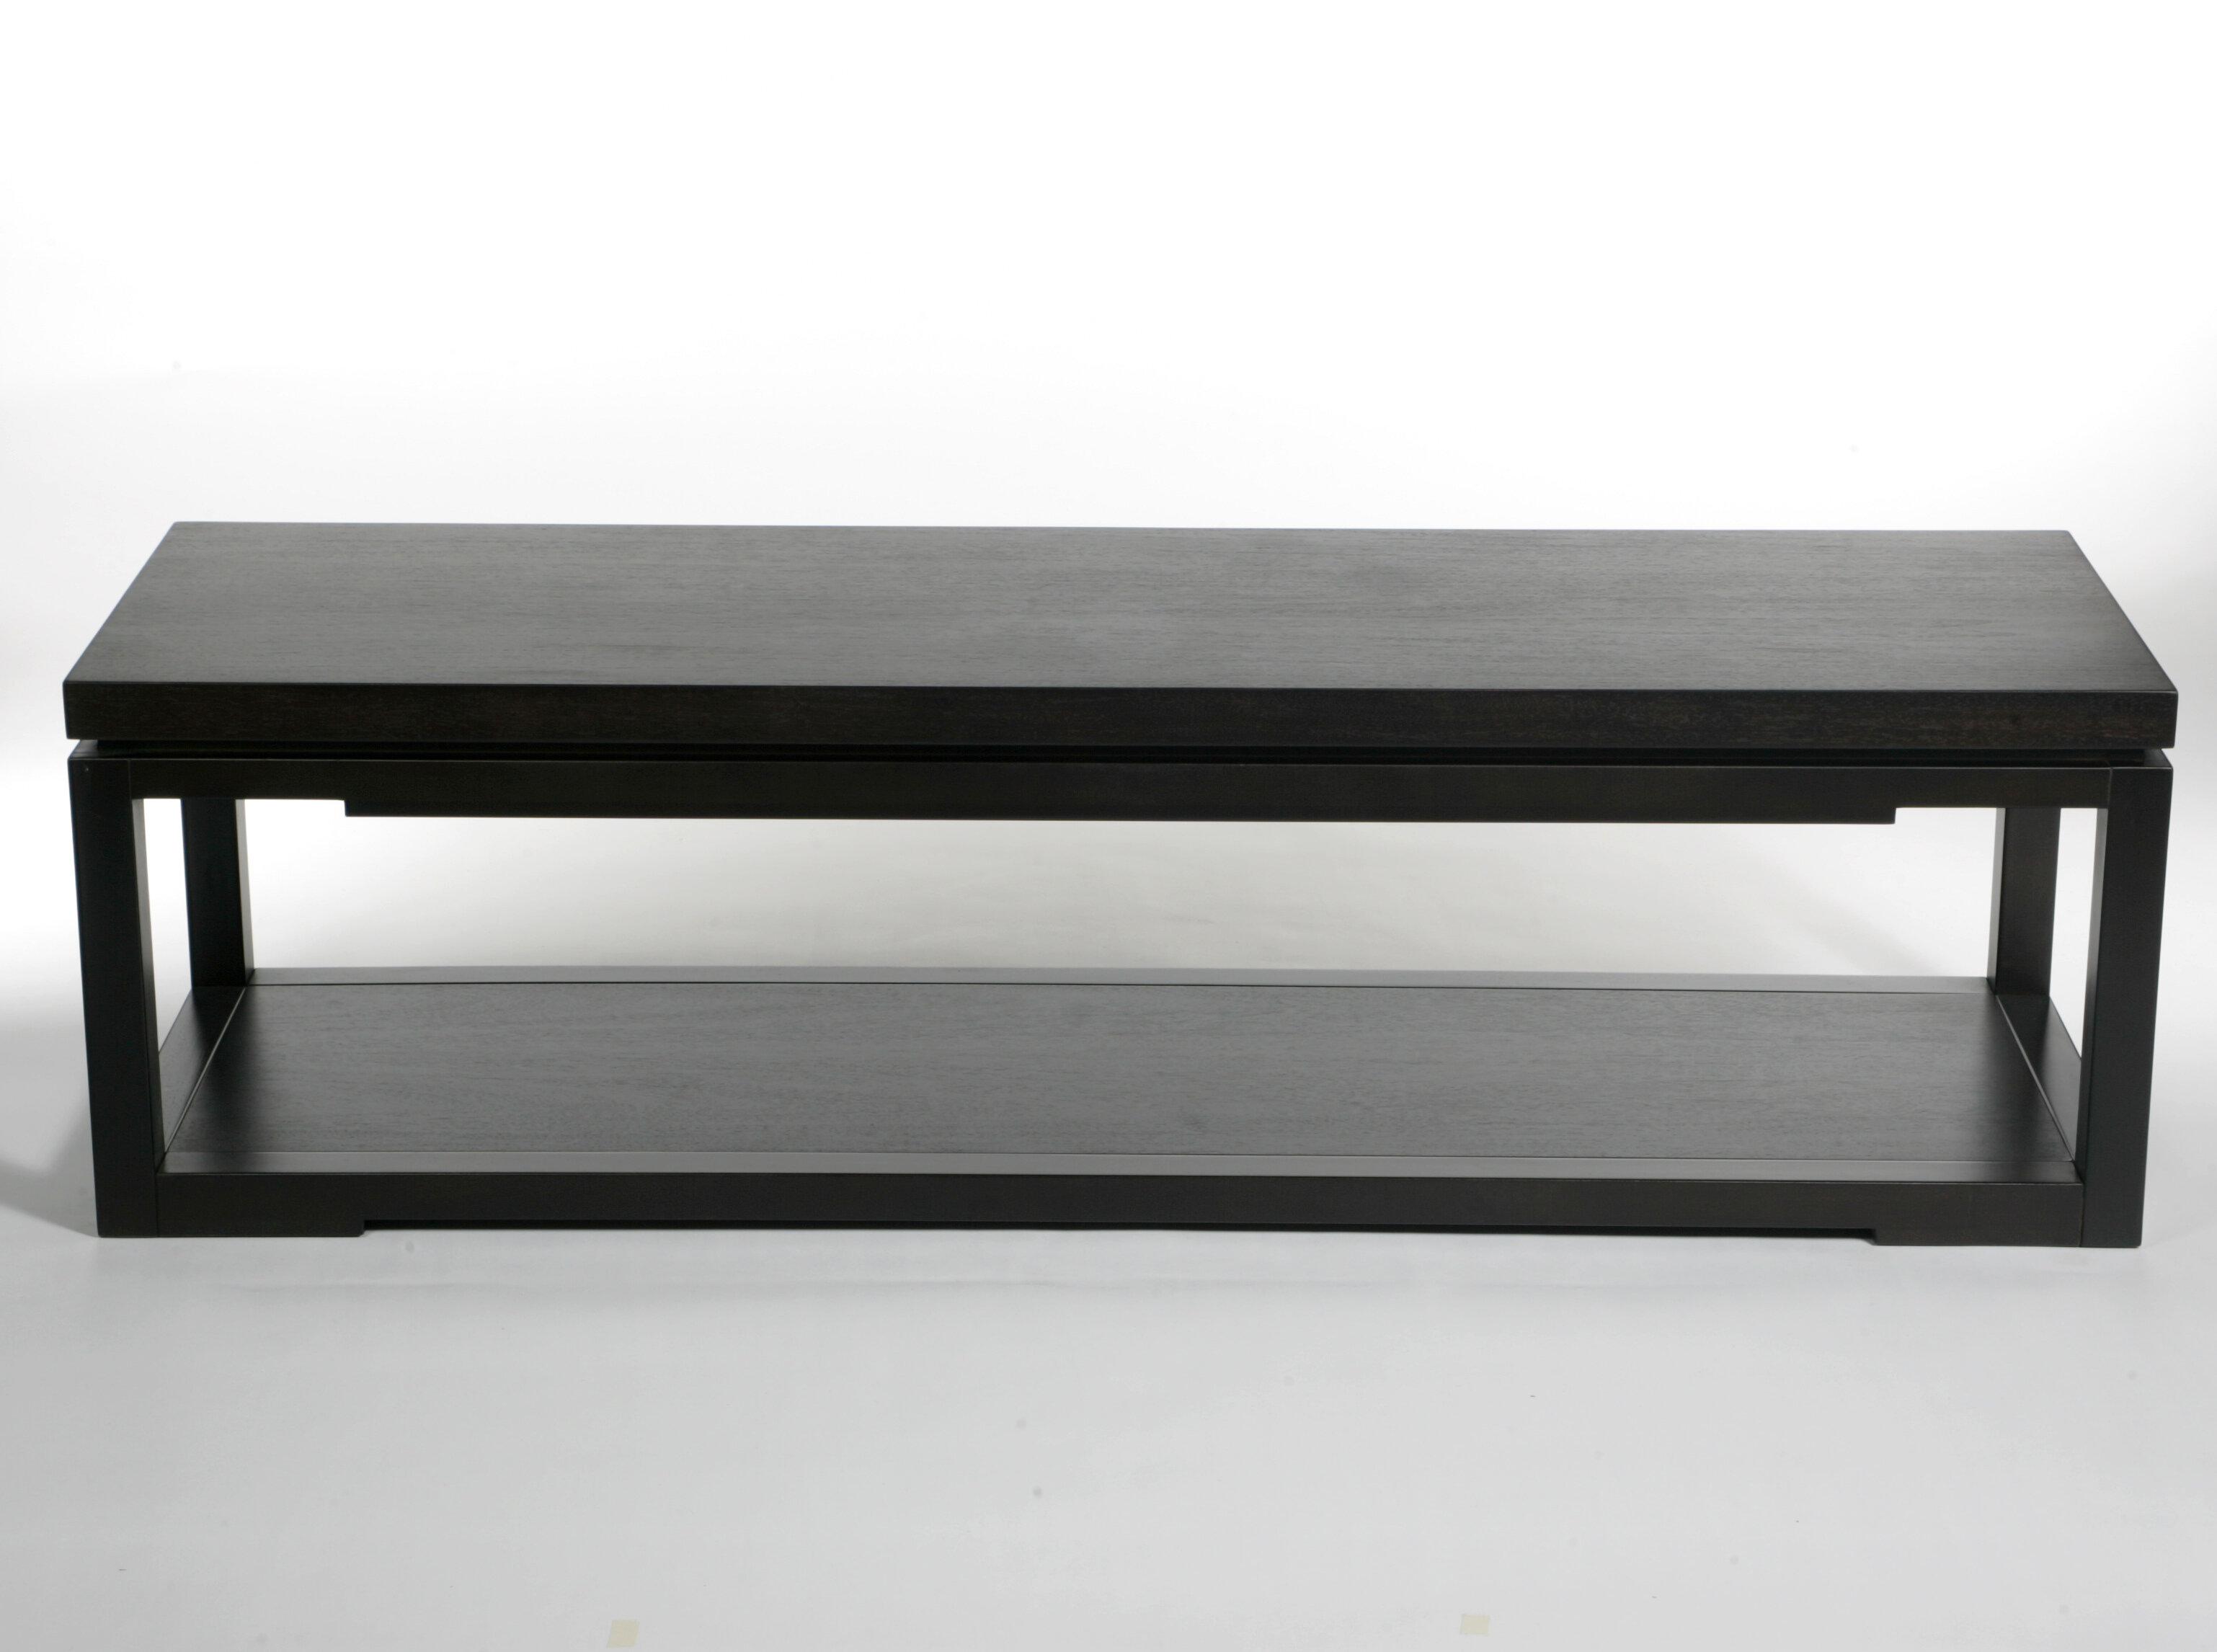 Brayden Studio Hardiman Solid Wood Coffee Table With Tray Top Wayfair